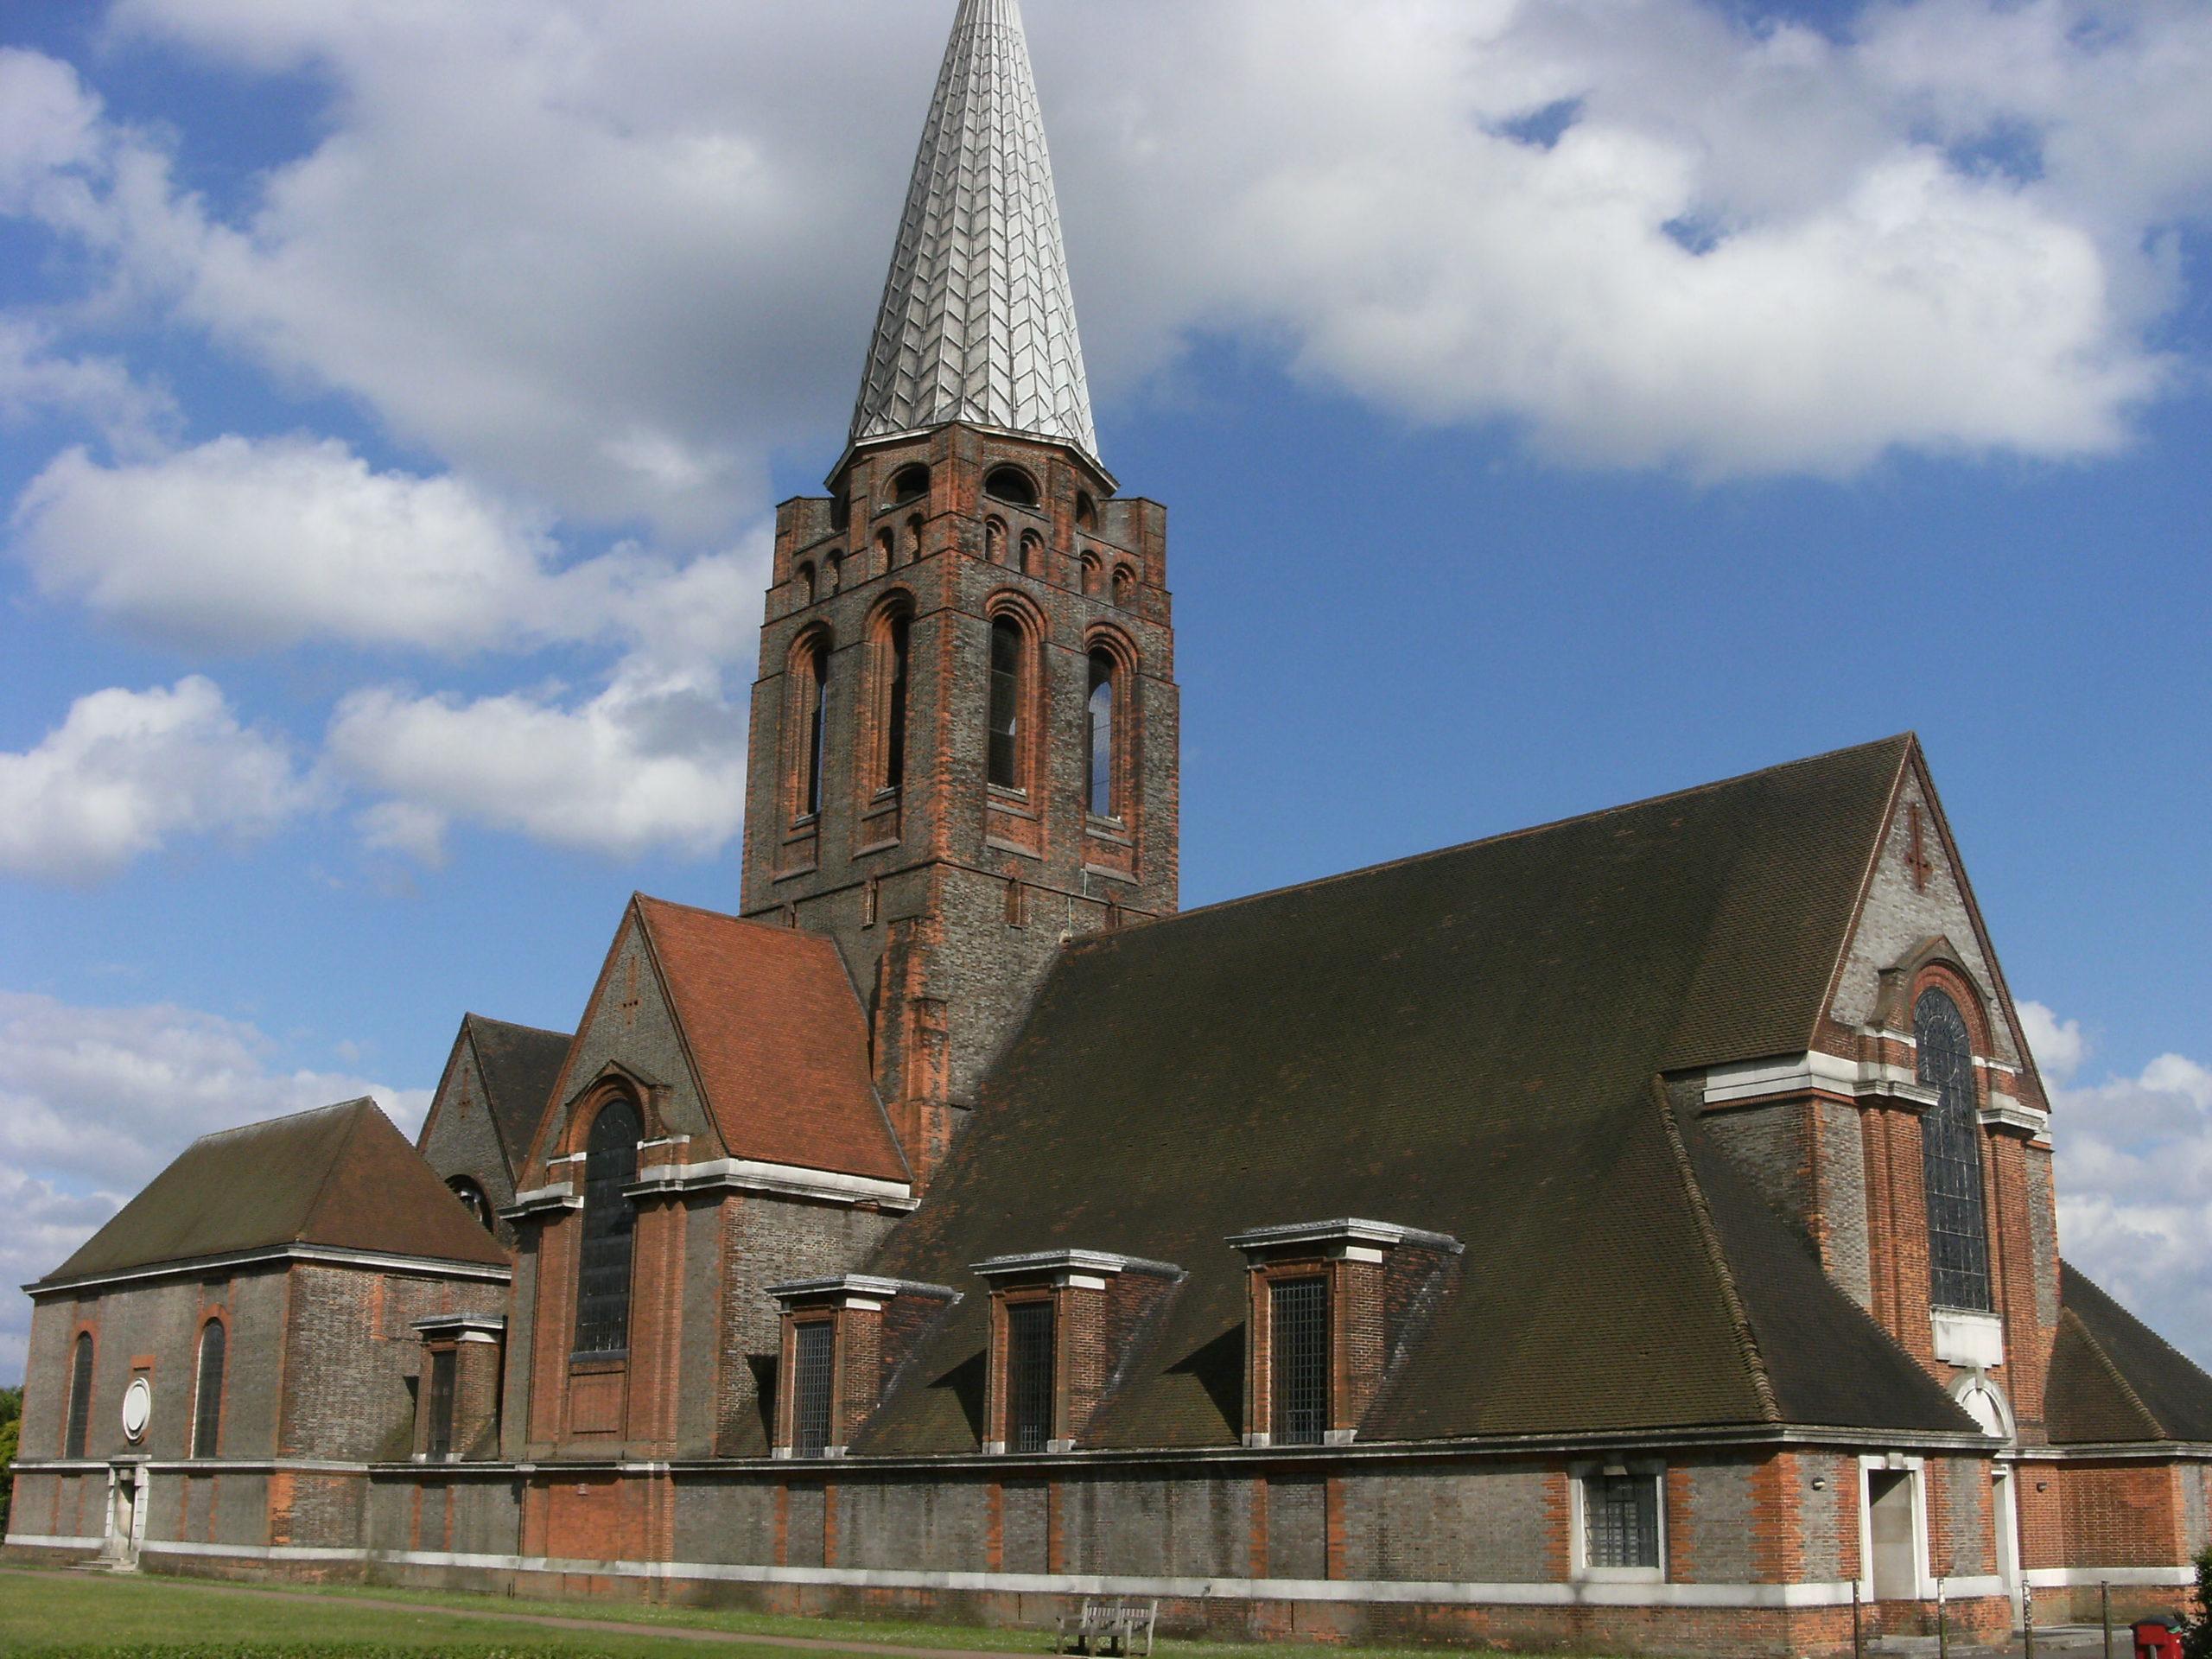 St Jude's Church Hampstead Garden Suburb